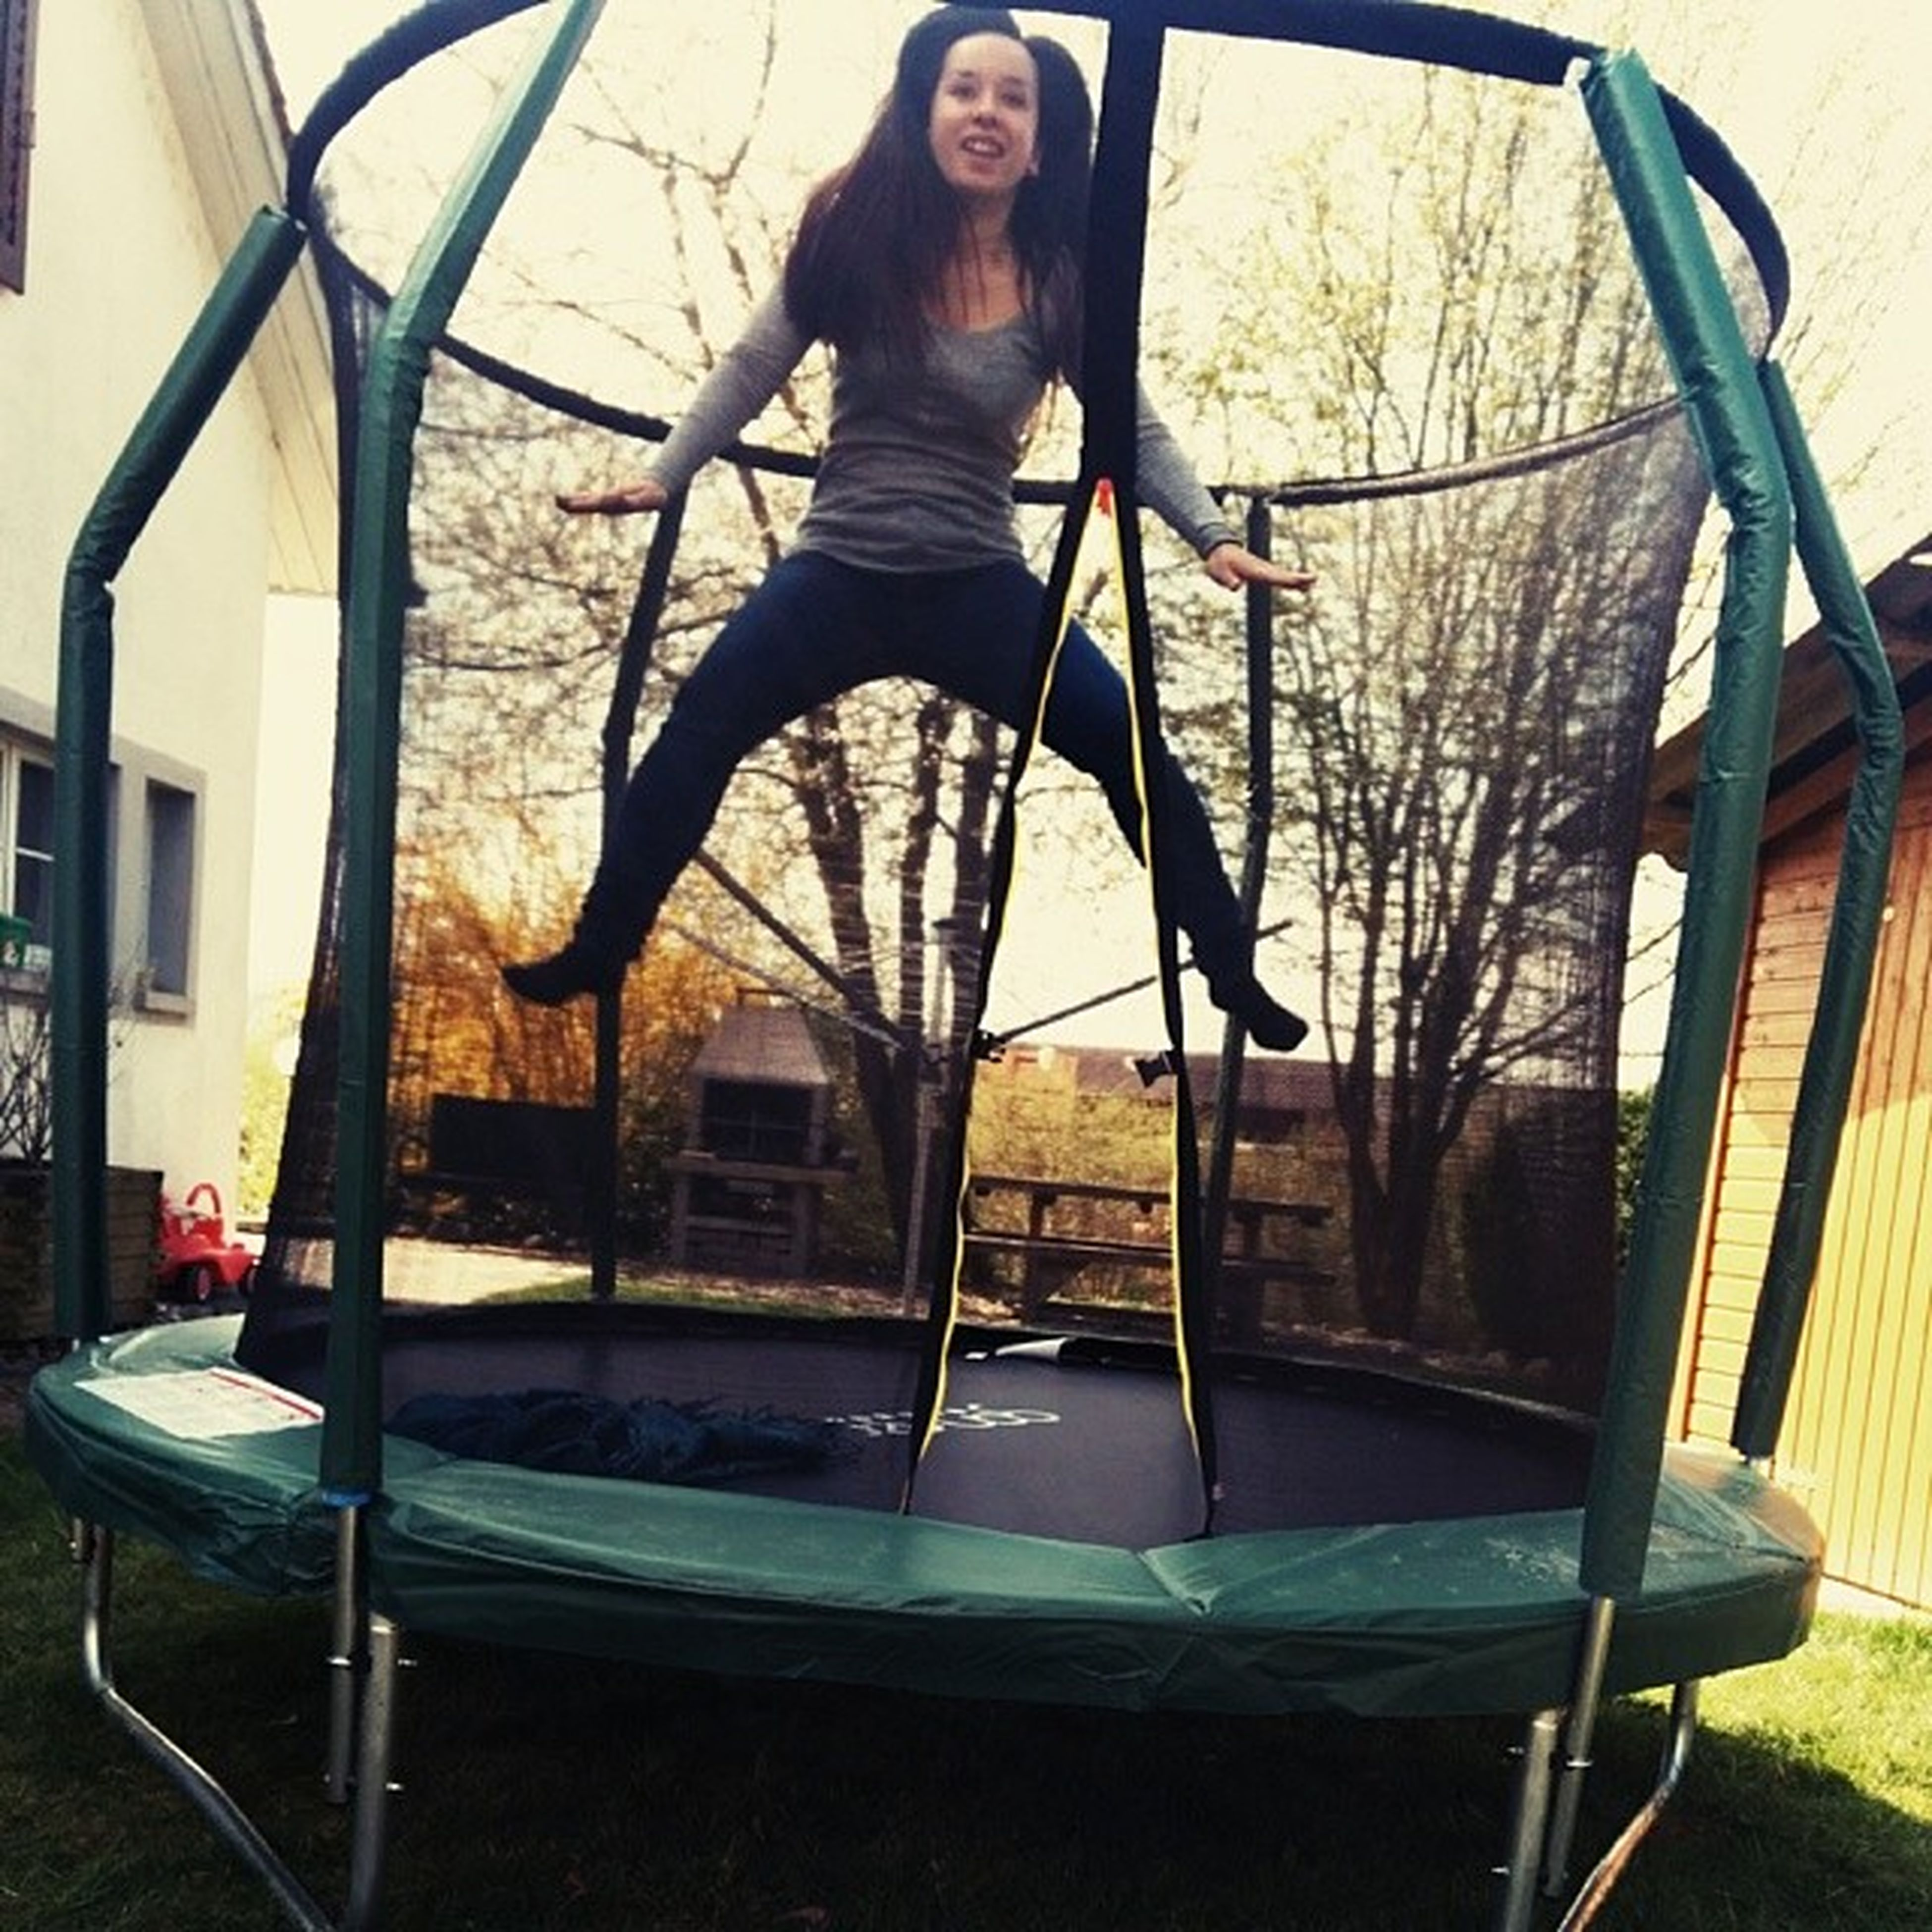 Imaginaryhoverboard Hoverboard Trampoline Jump nevertooold yippie yay sundayfunday youjelly